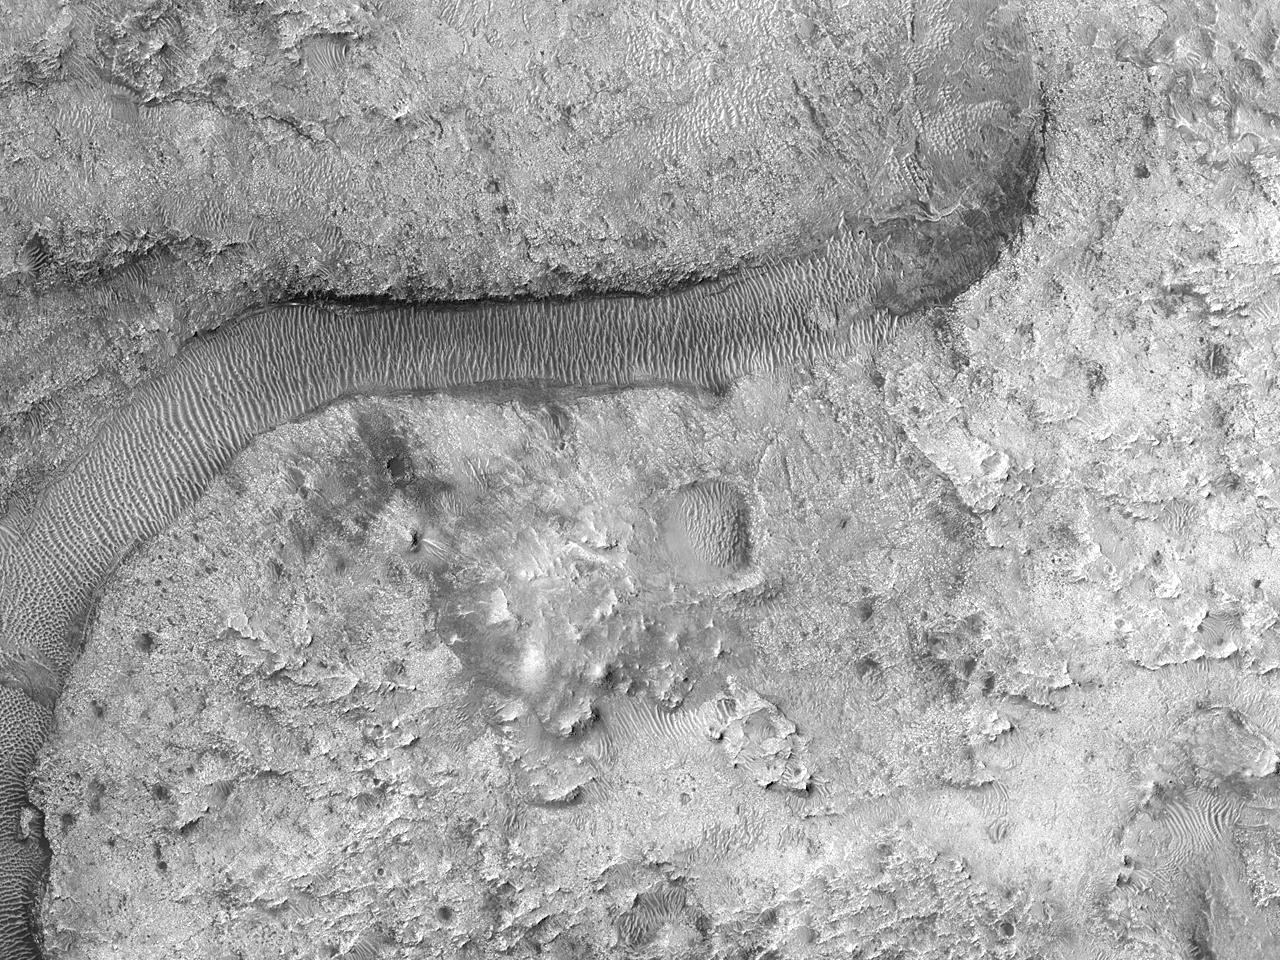 Канал с дюнами на север от кратера Jezero